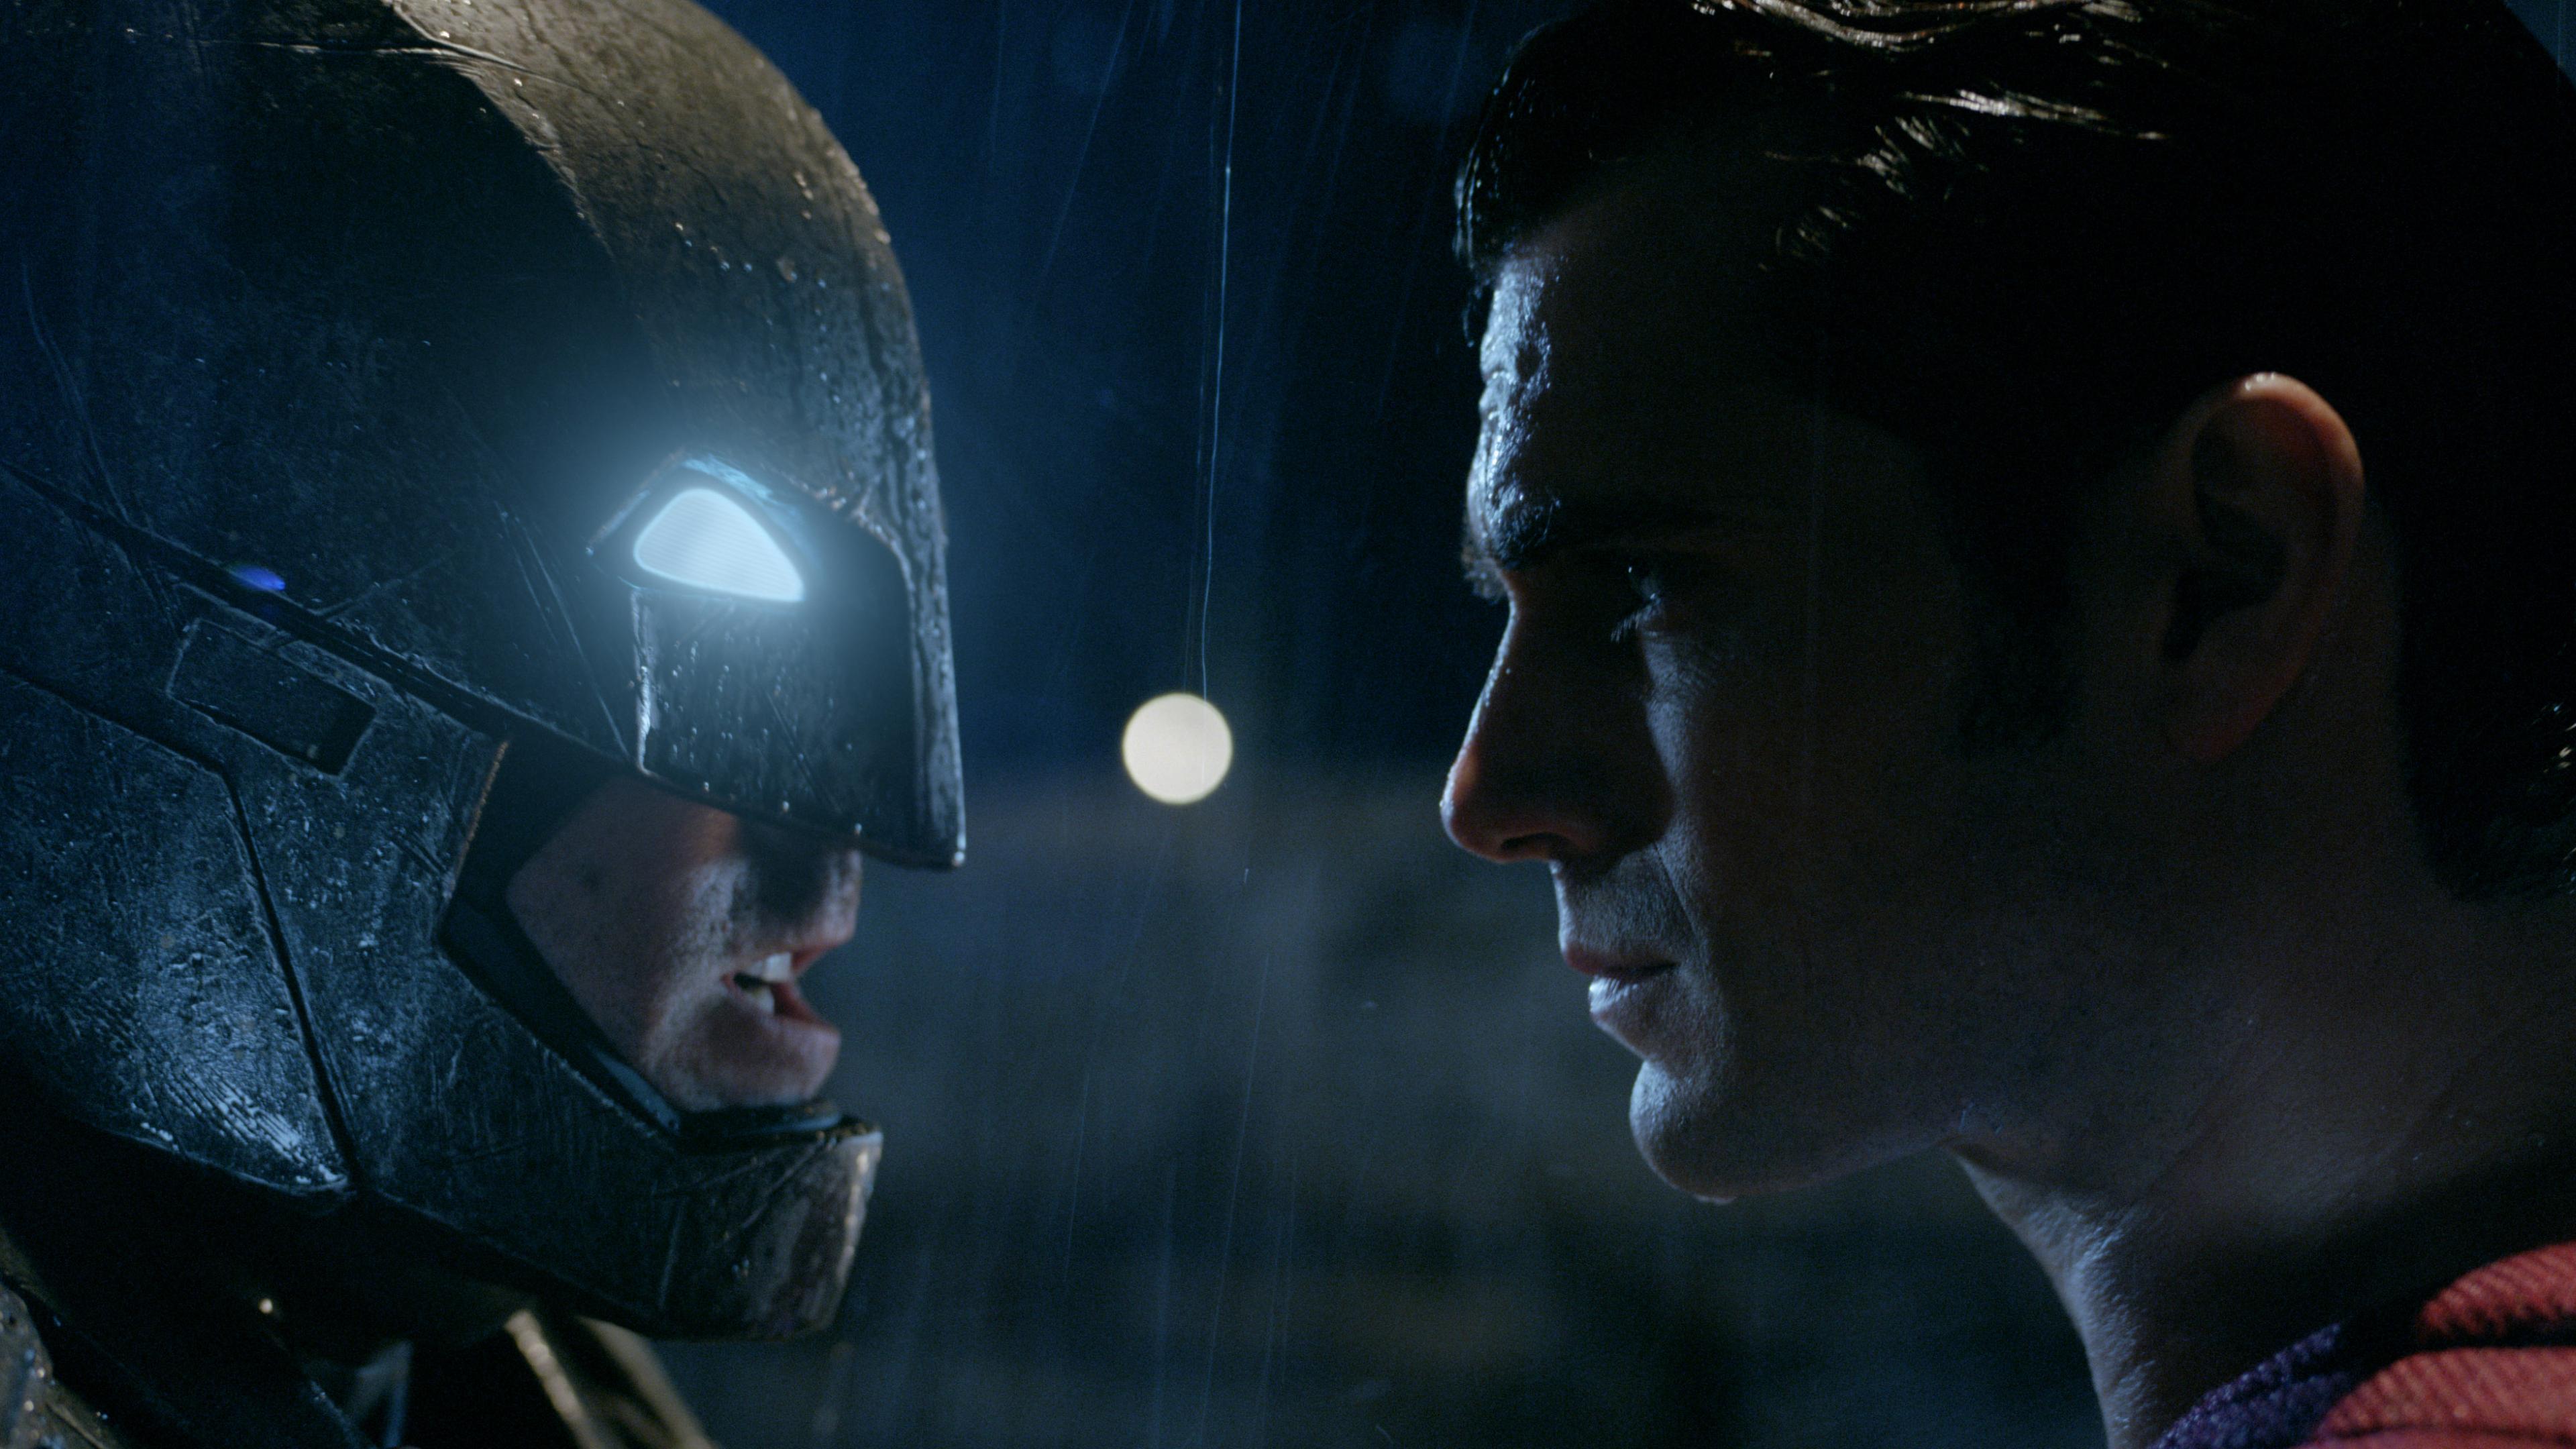 3840x2160 Batman Vs Superman Poster 4k Wallpaper Hd Movies 4k